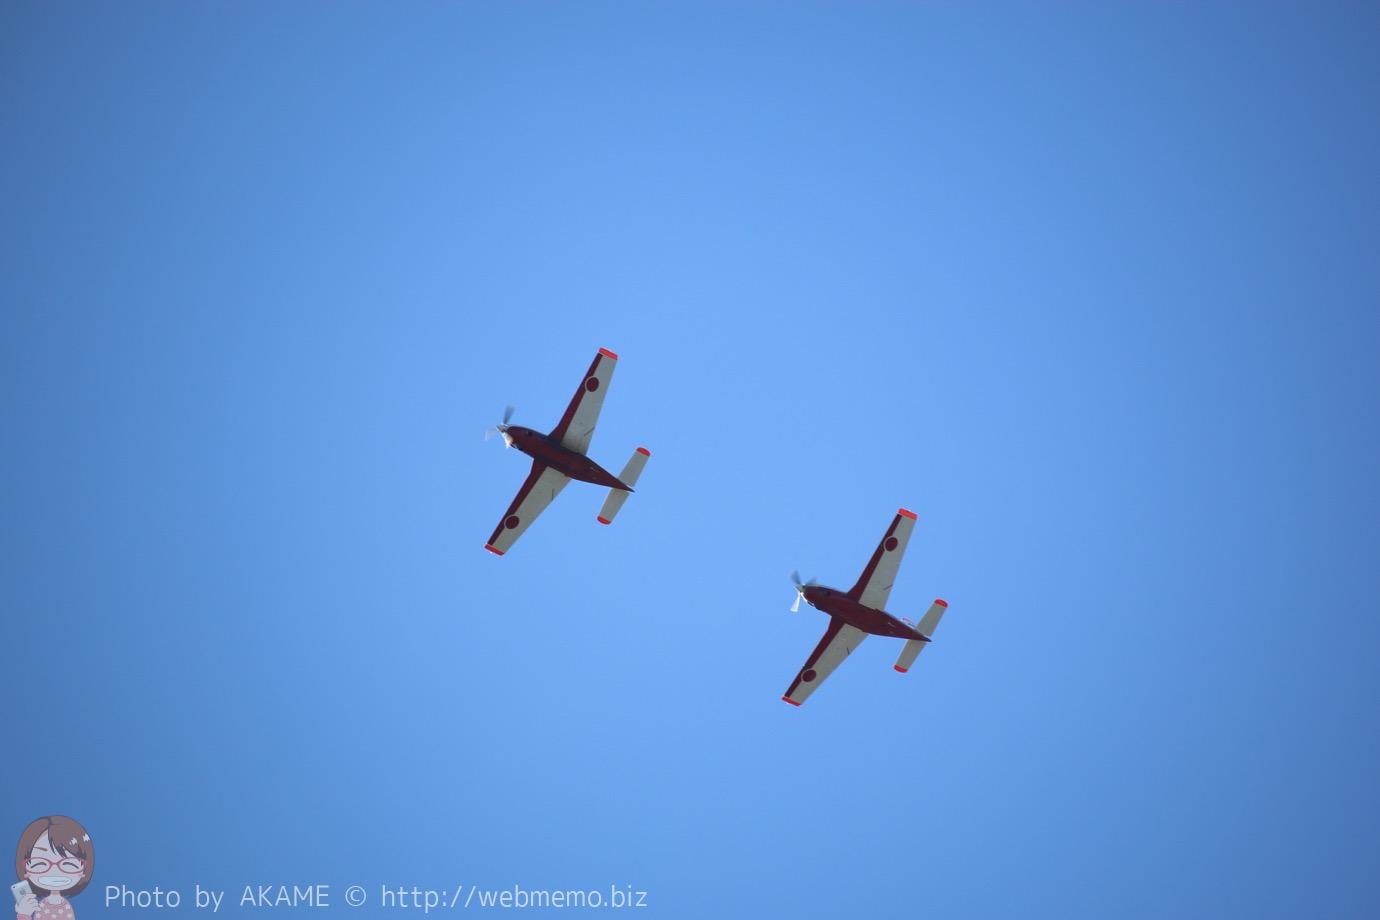 T-7(機動飛行)の展示飛行の様子